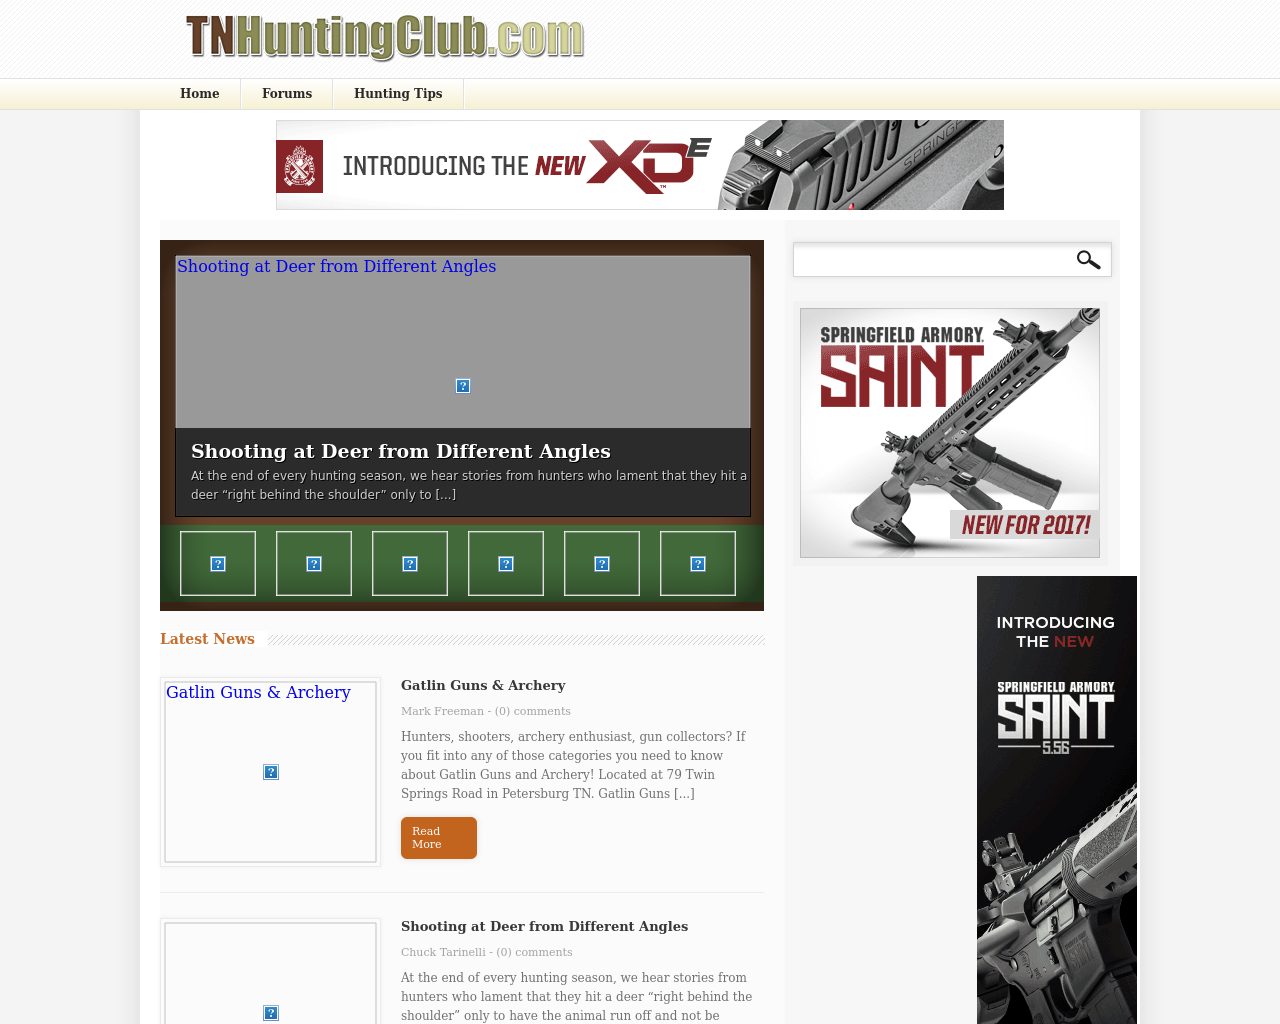 TNHuntingClub.com-Advertising-Reviews-Pricing